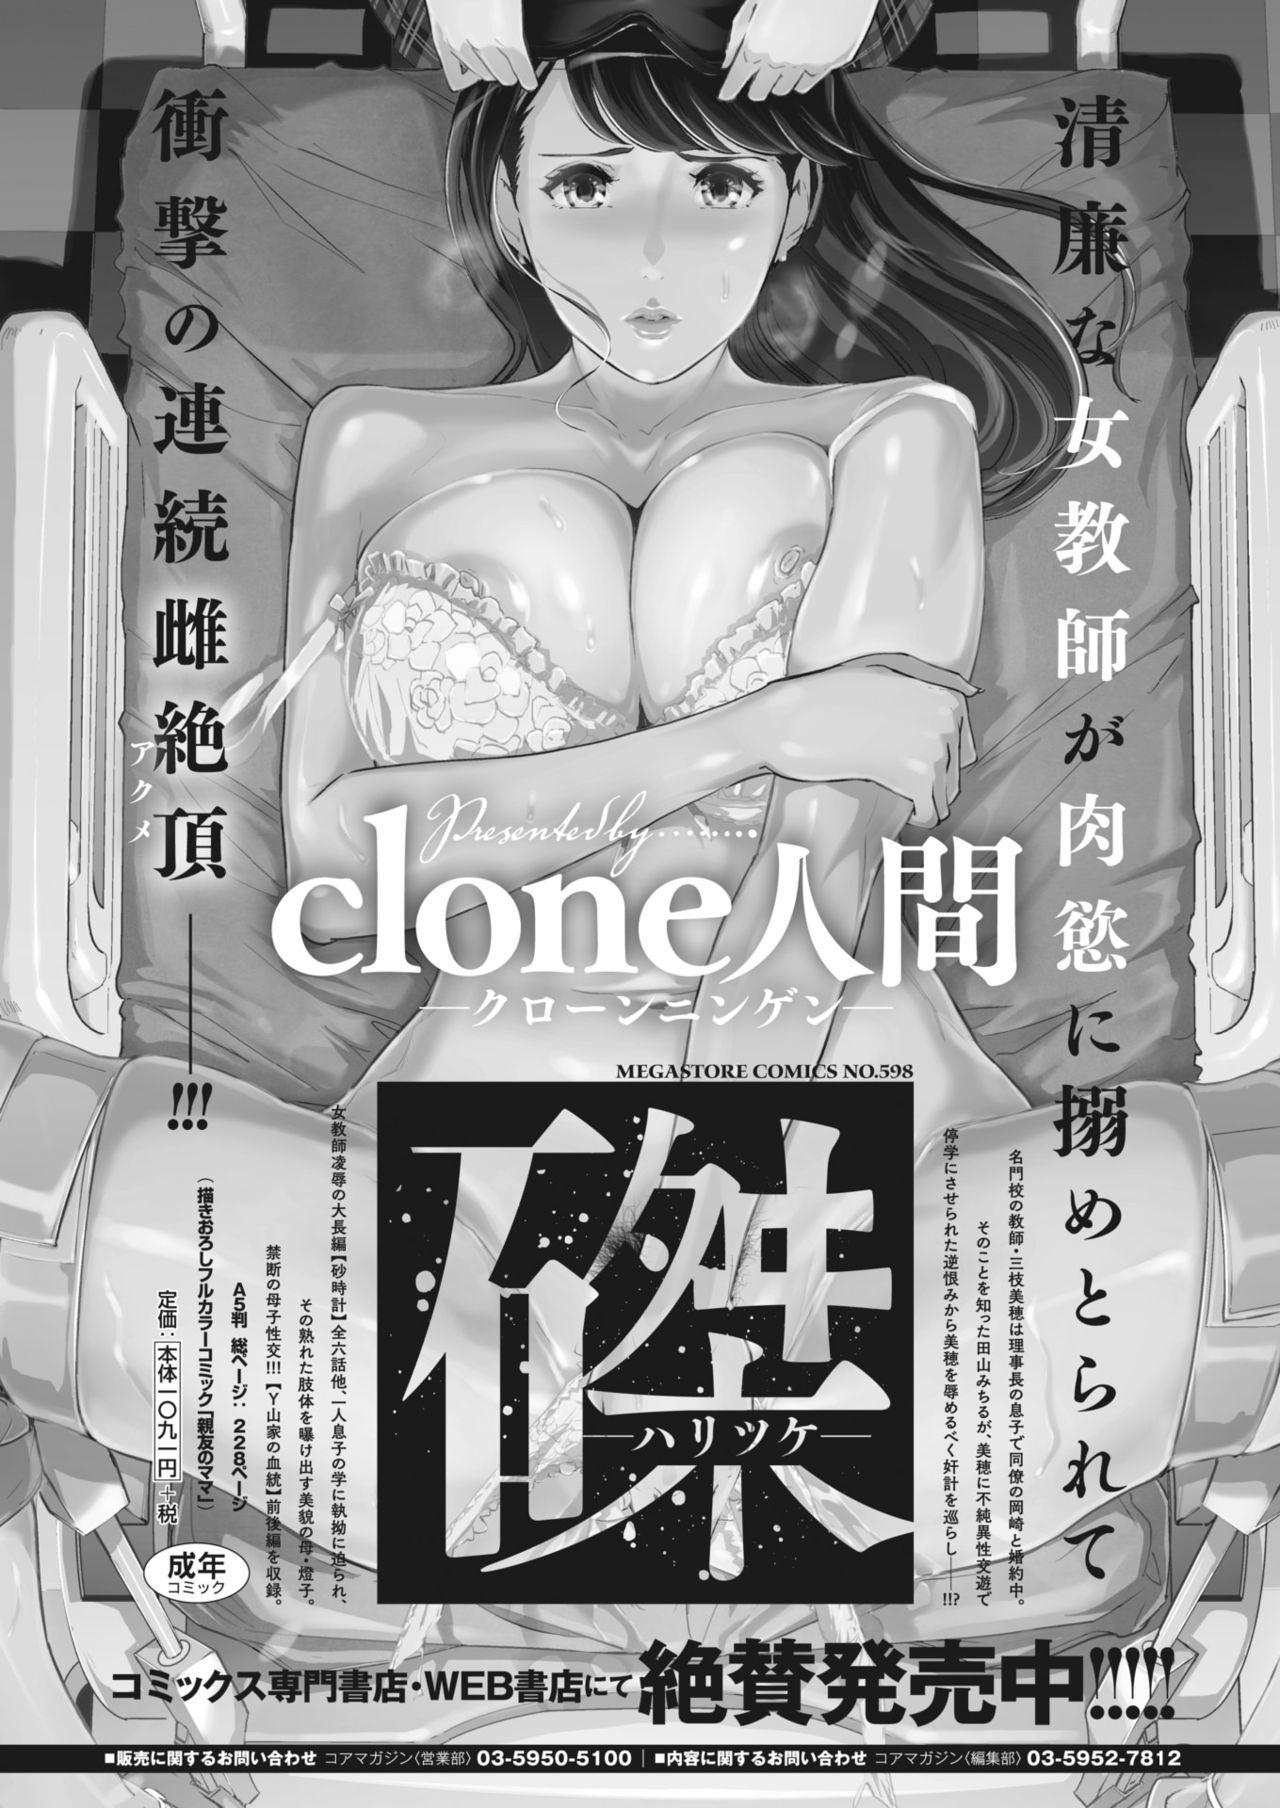 COMIC HOTMiLK Koime Vol. 21 256